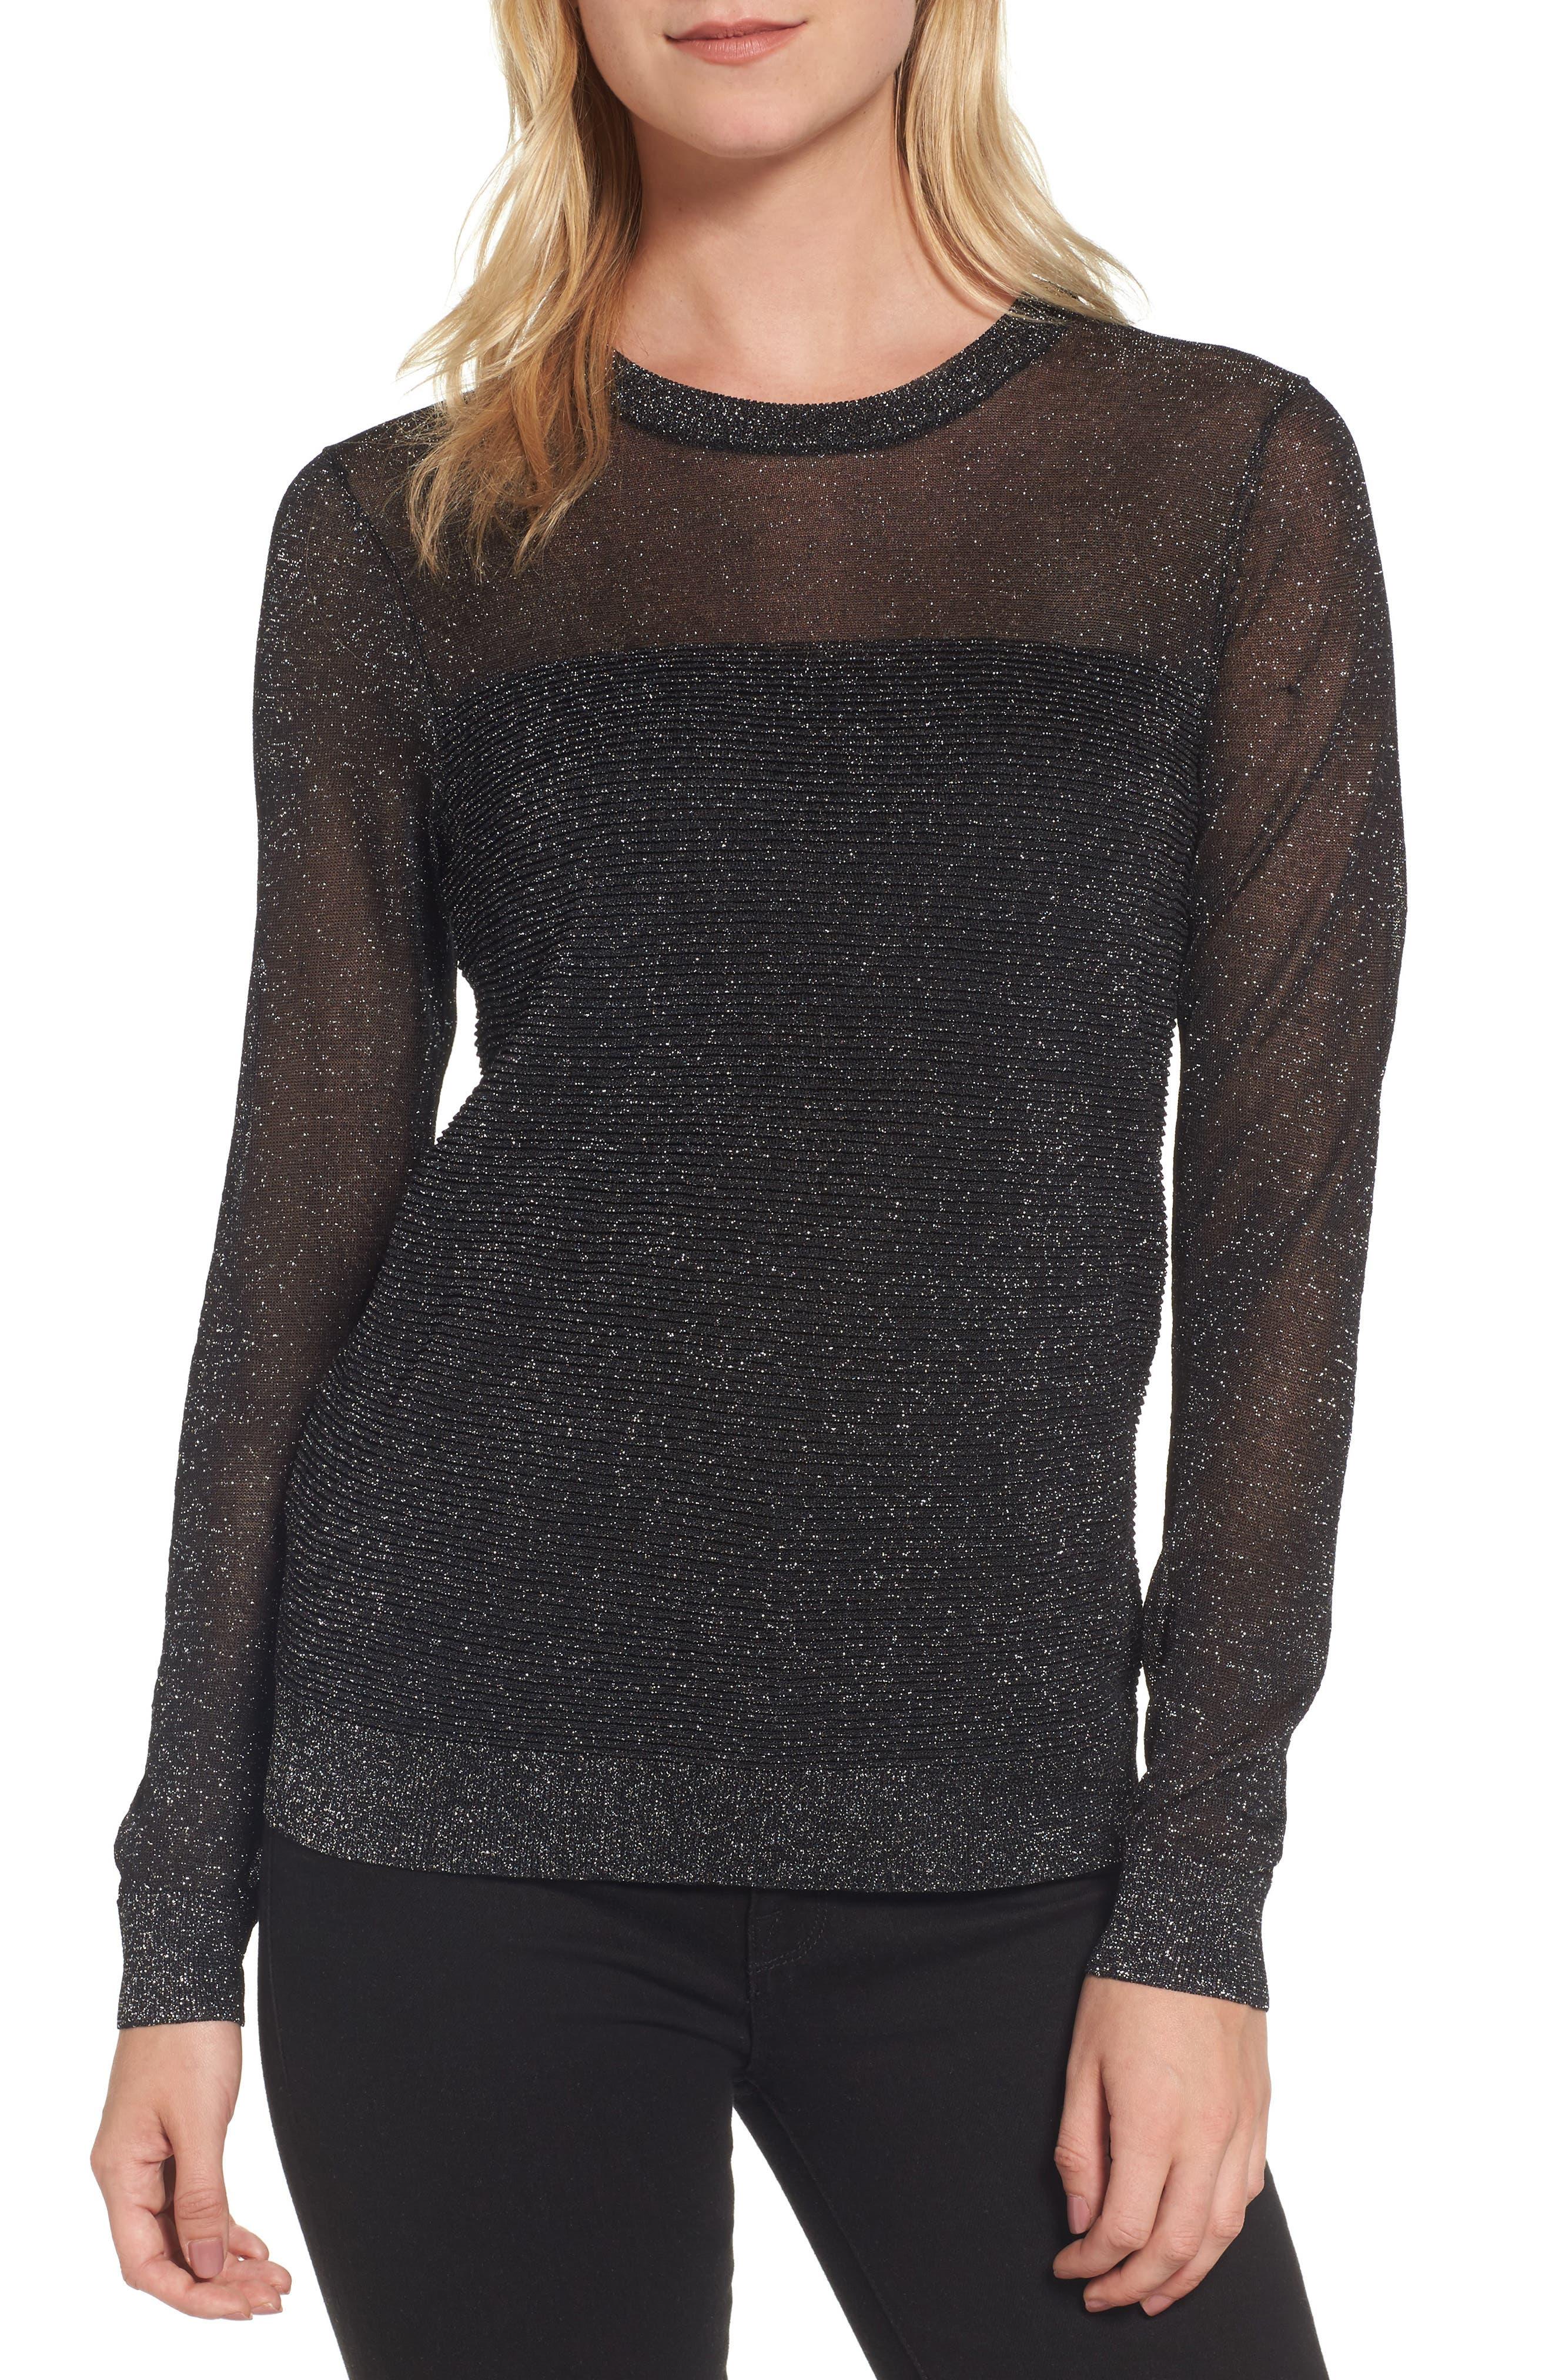 Sheer Metallic Overlay Sweater,                             Main thumbnail 1, color,                             001